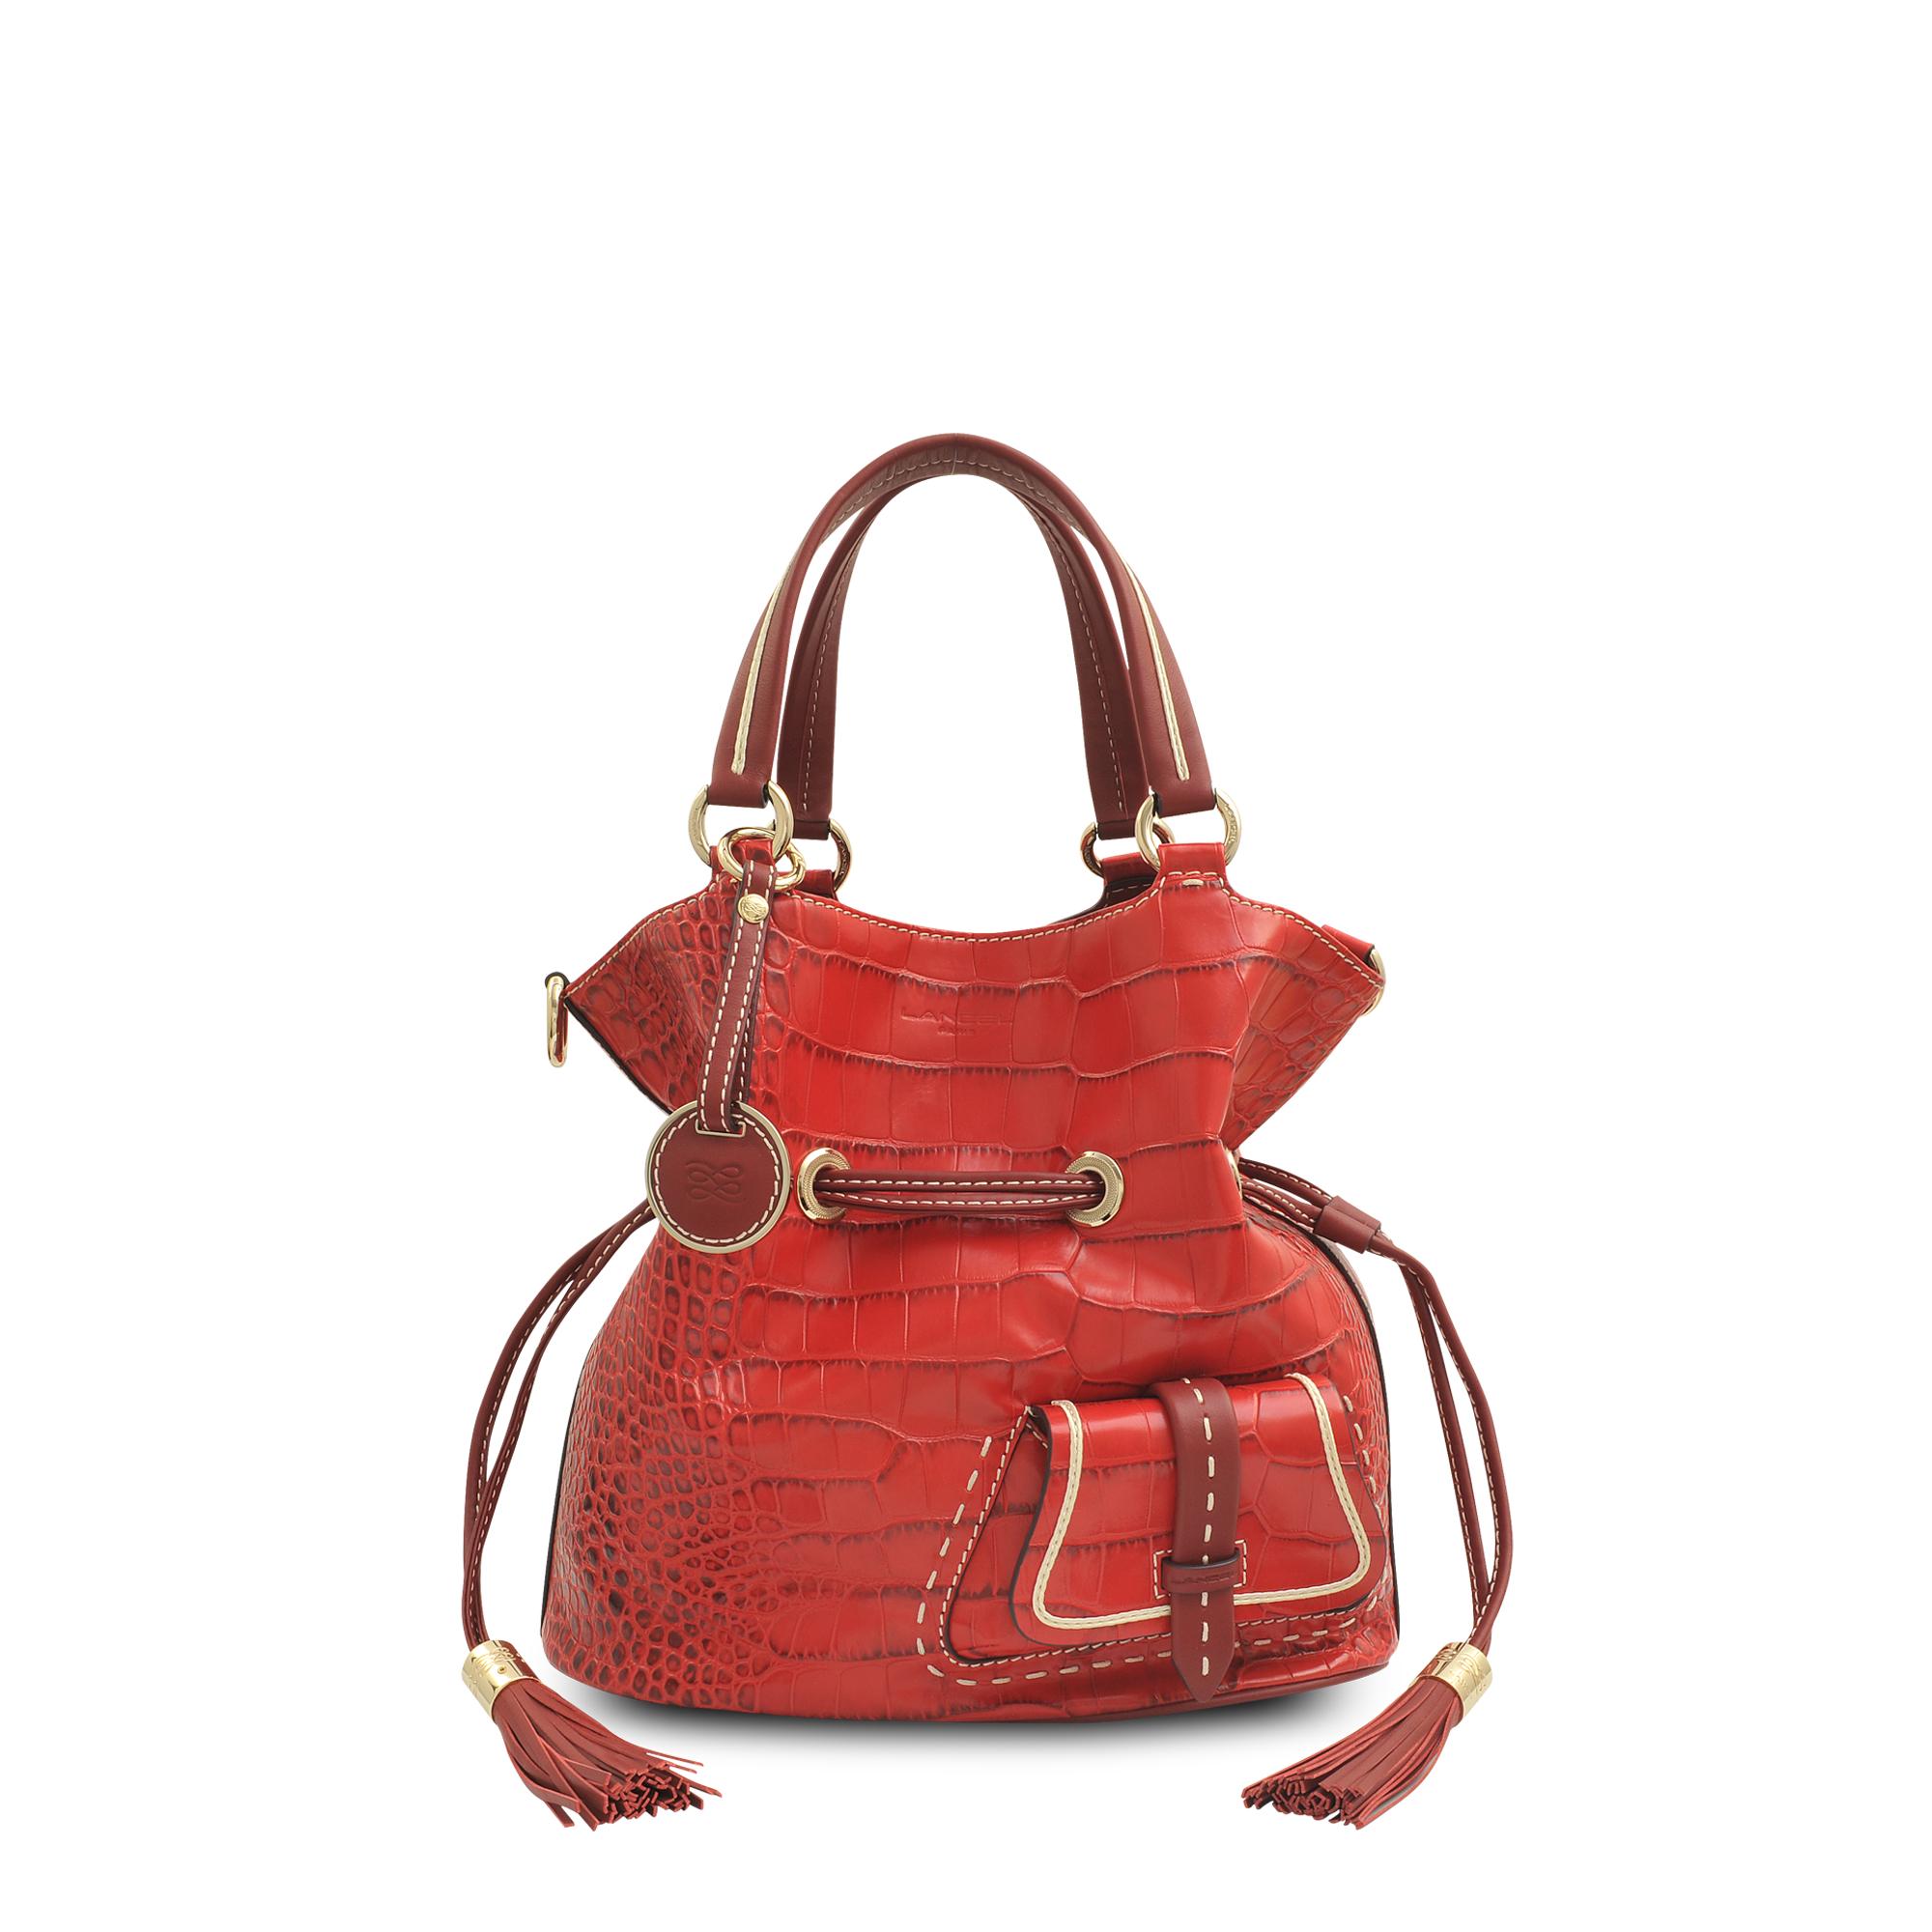 c5c6ab2adf44 Lancel Premier Flirt Bucket Bag in Red - Lyst